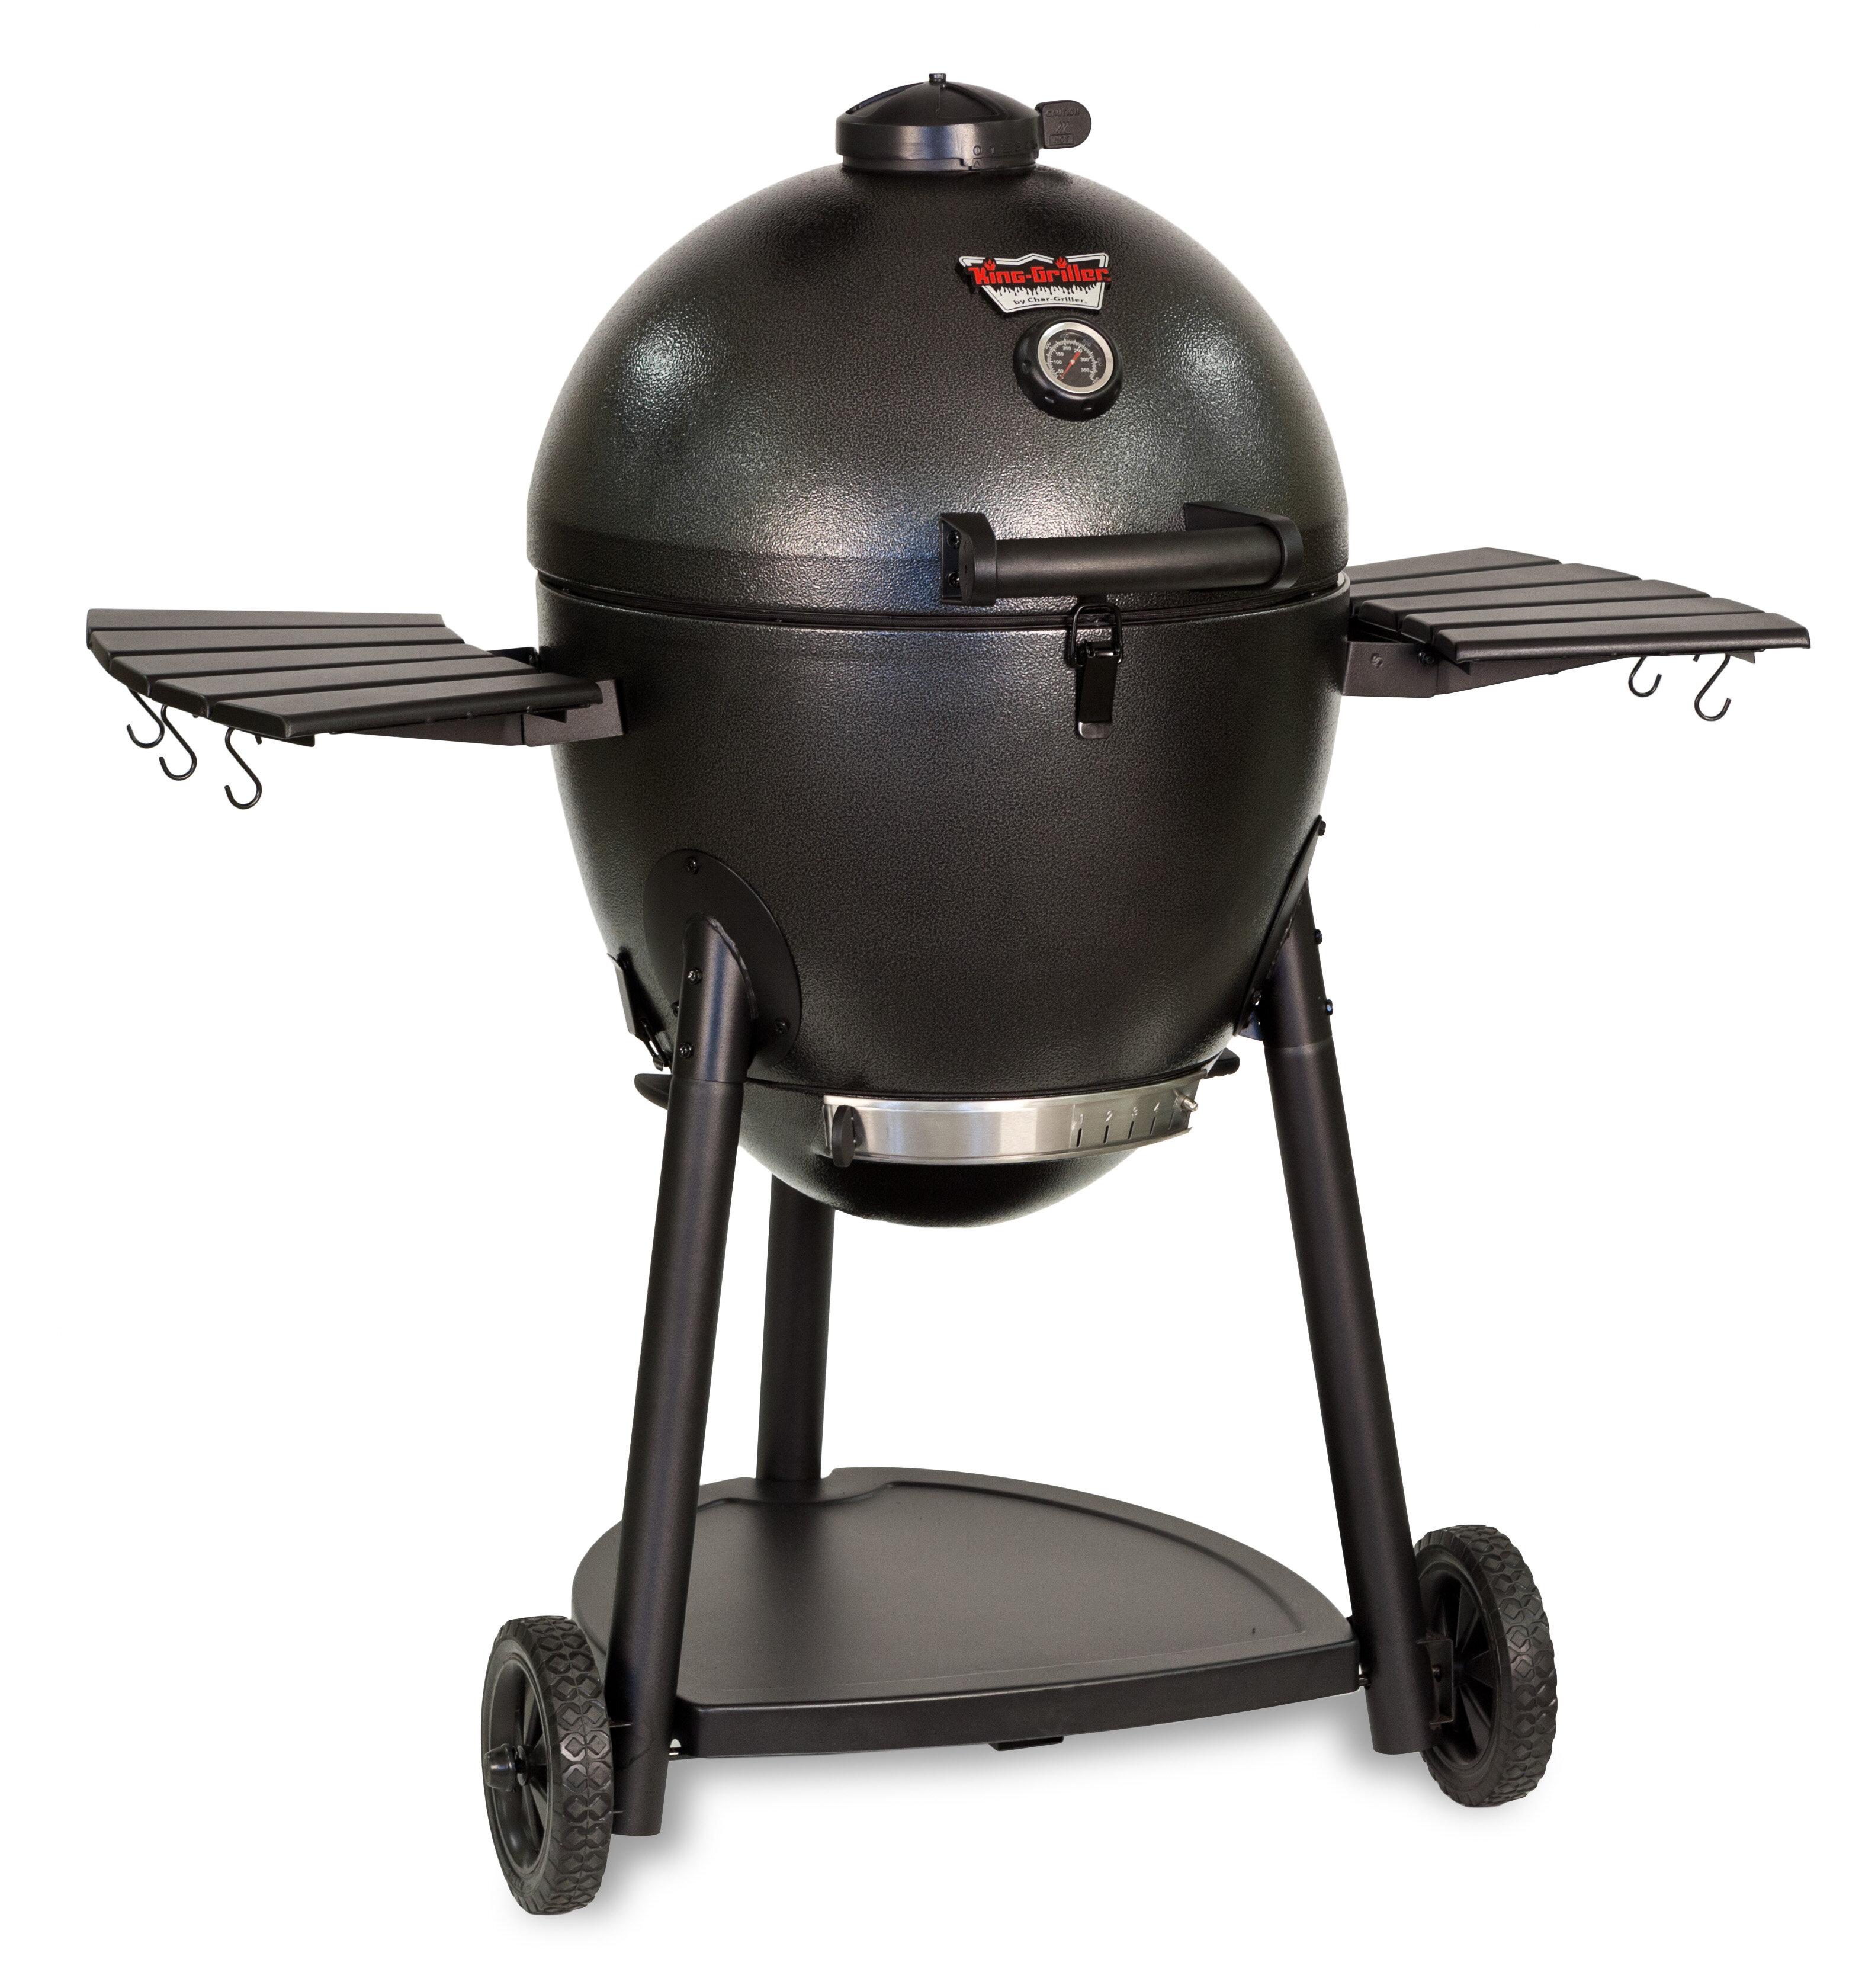 Char griller 20 akorn kamado charcoal grill reviews wayfair dailygadgetfo Images